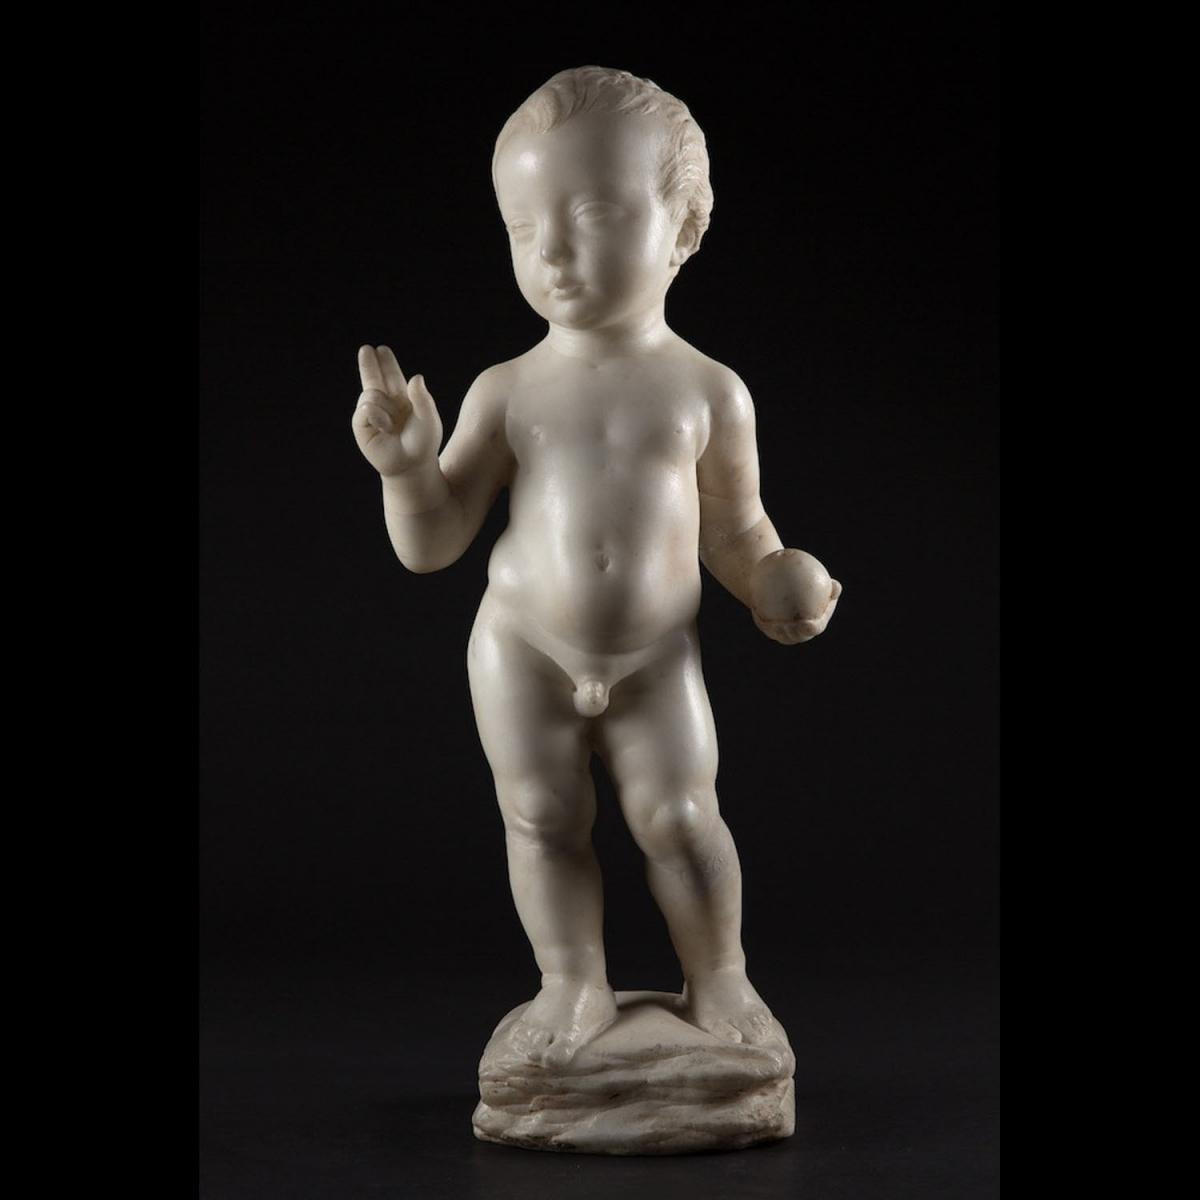 Photo of jesus-1500-baccio-di-montelupo-ex-metropolitan-museum-collection-galerie-golconda